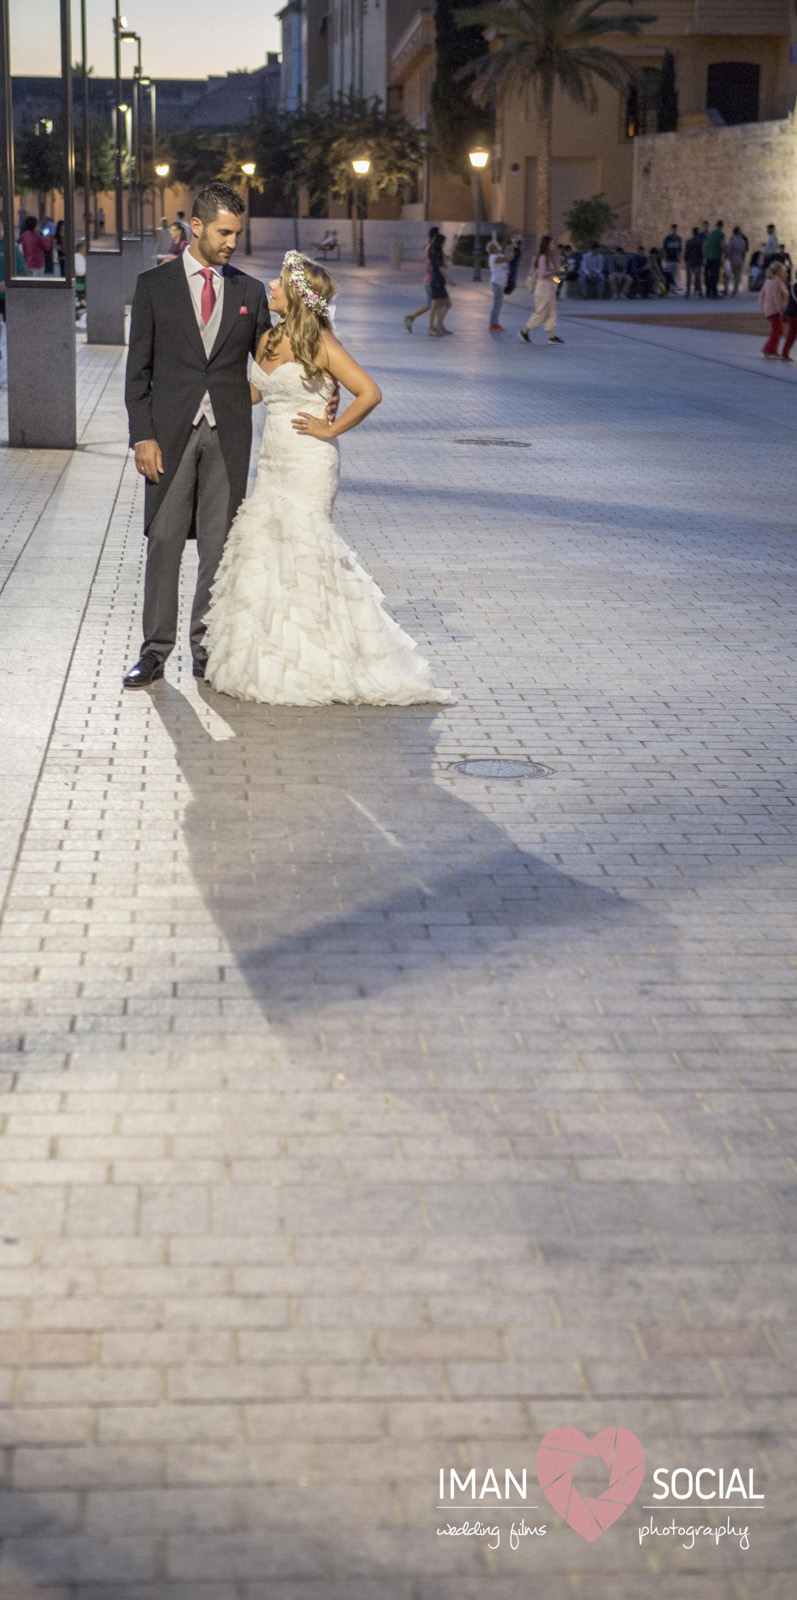 77B1151 Juan Antonio y Mónica - Postboda - video boda cordoba